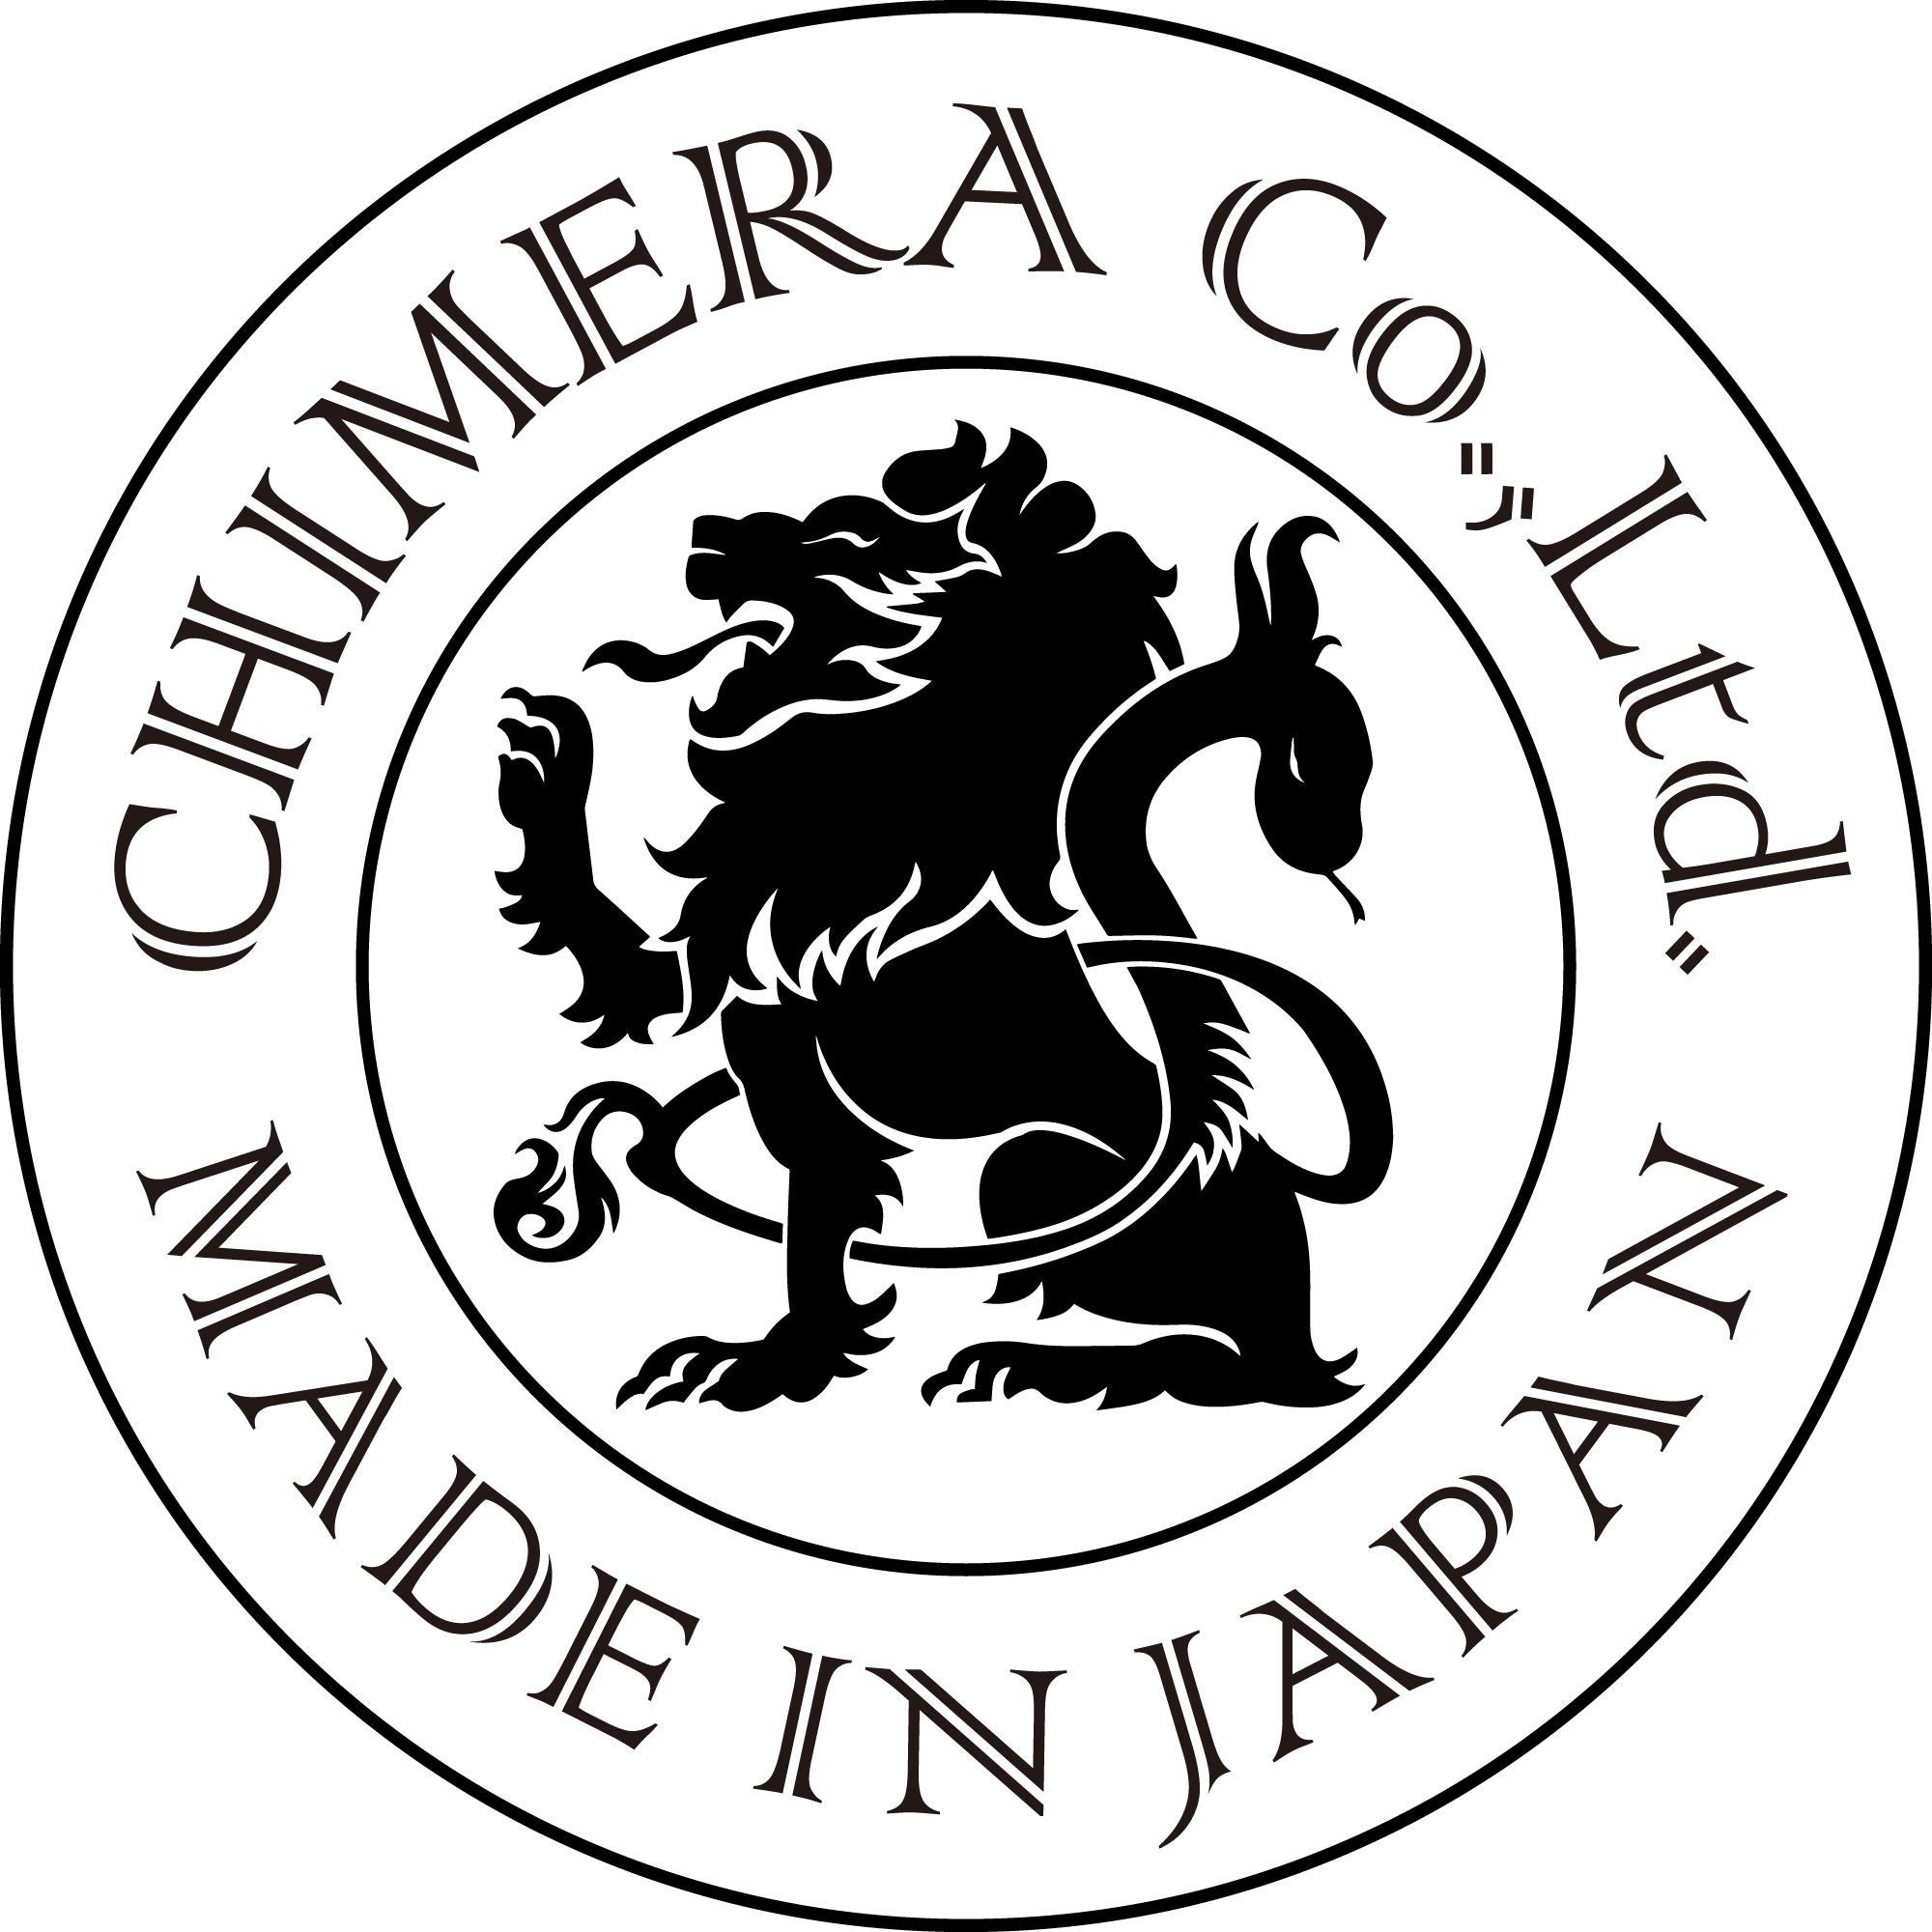 CHIMERA TOKYO